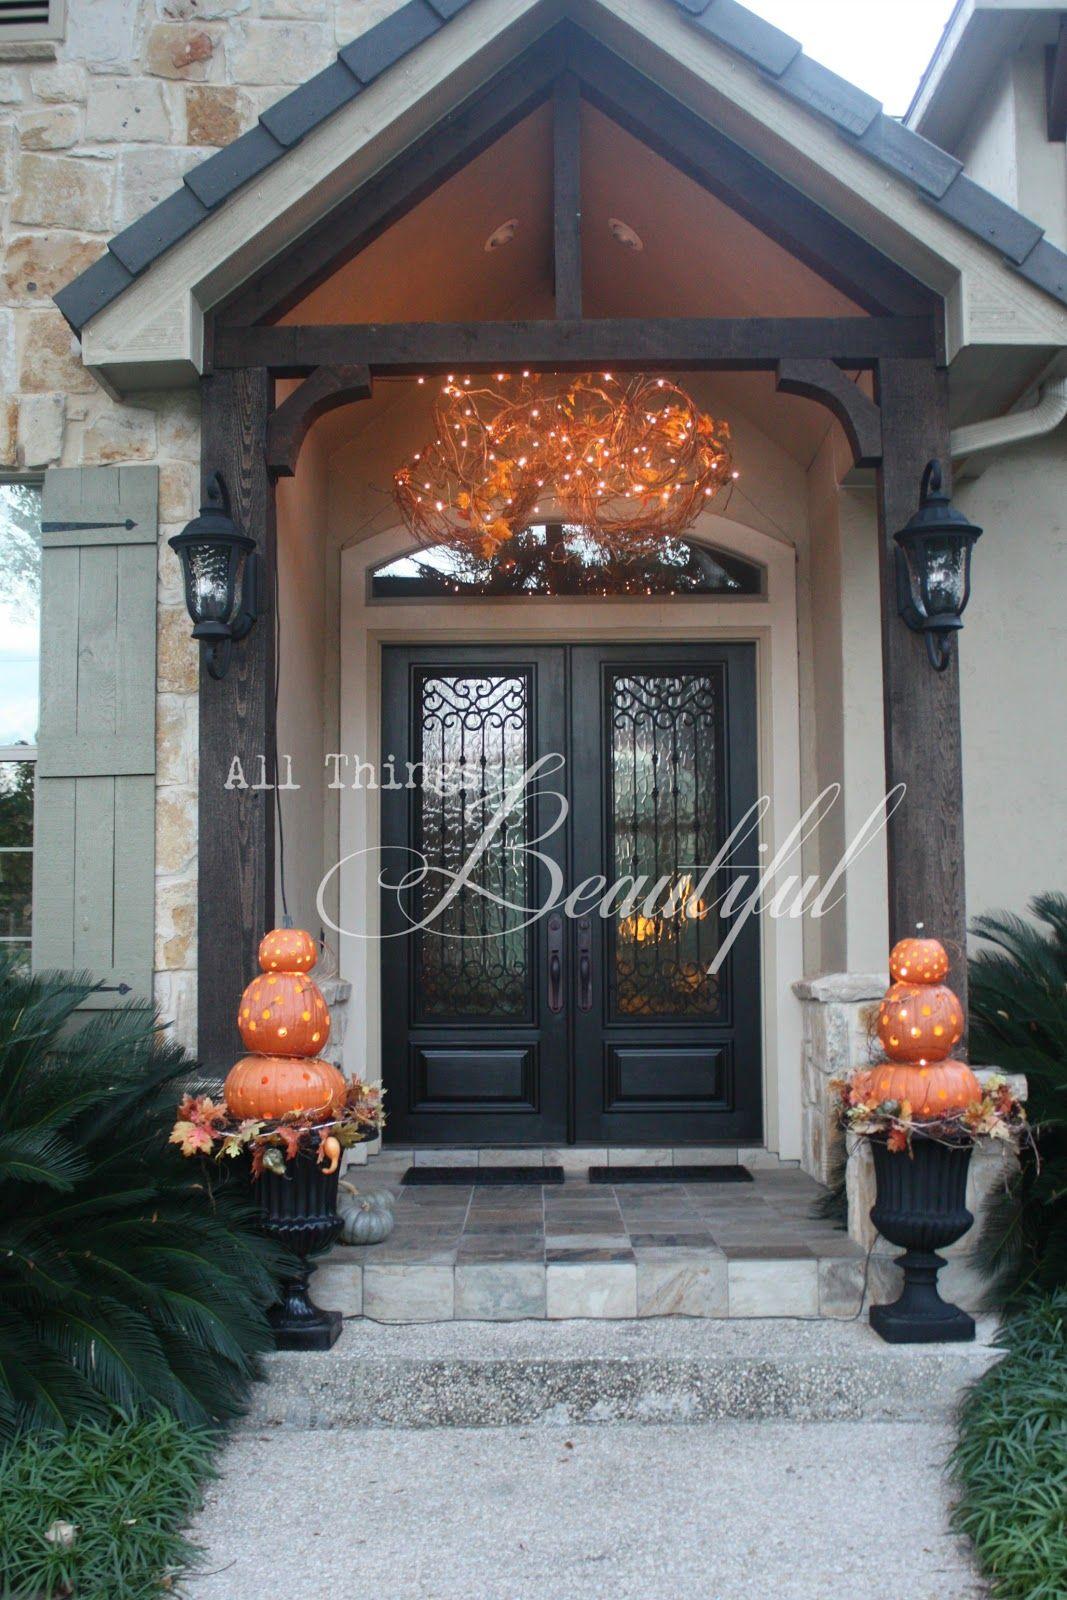 All Things Beautiful Fall Porch Lighting Fall Front Porch Decor Fall Porch Front Porch Decorating